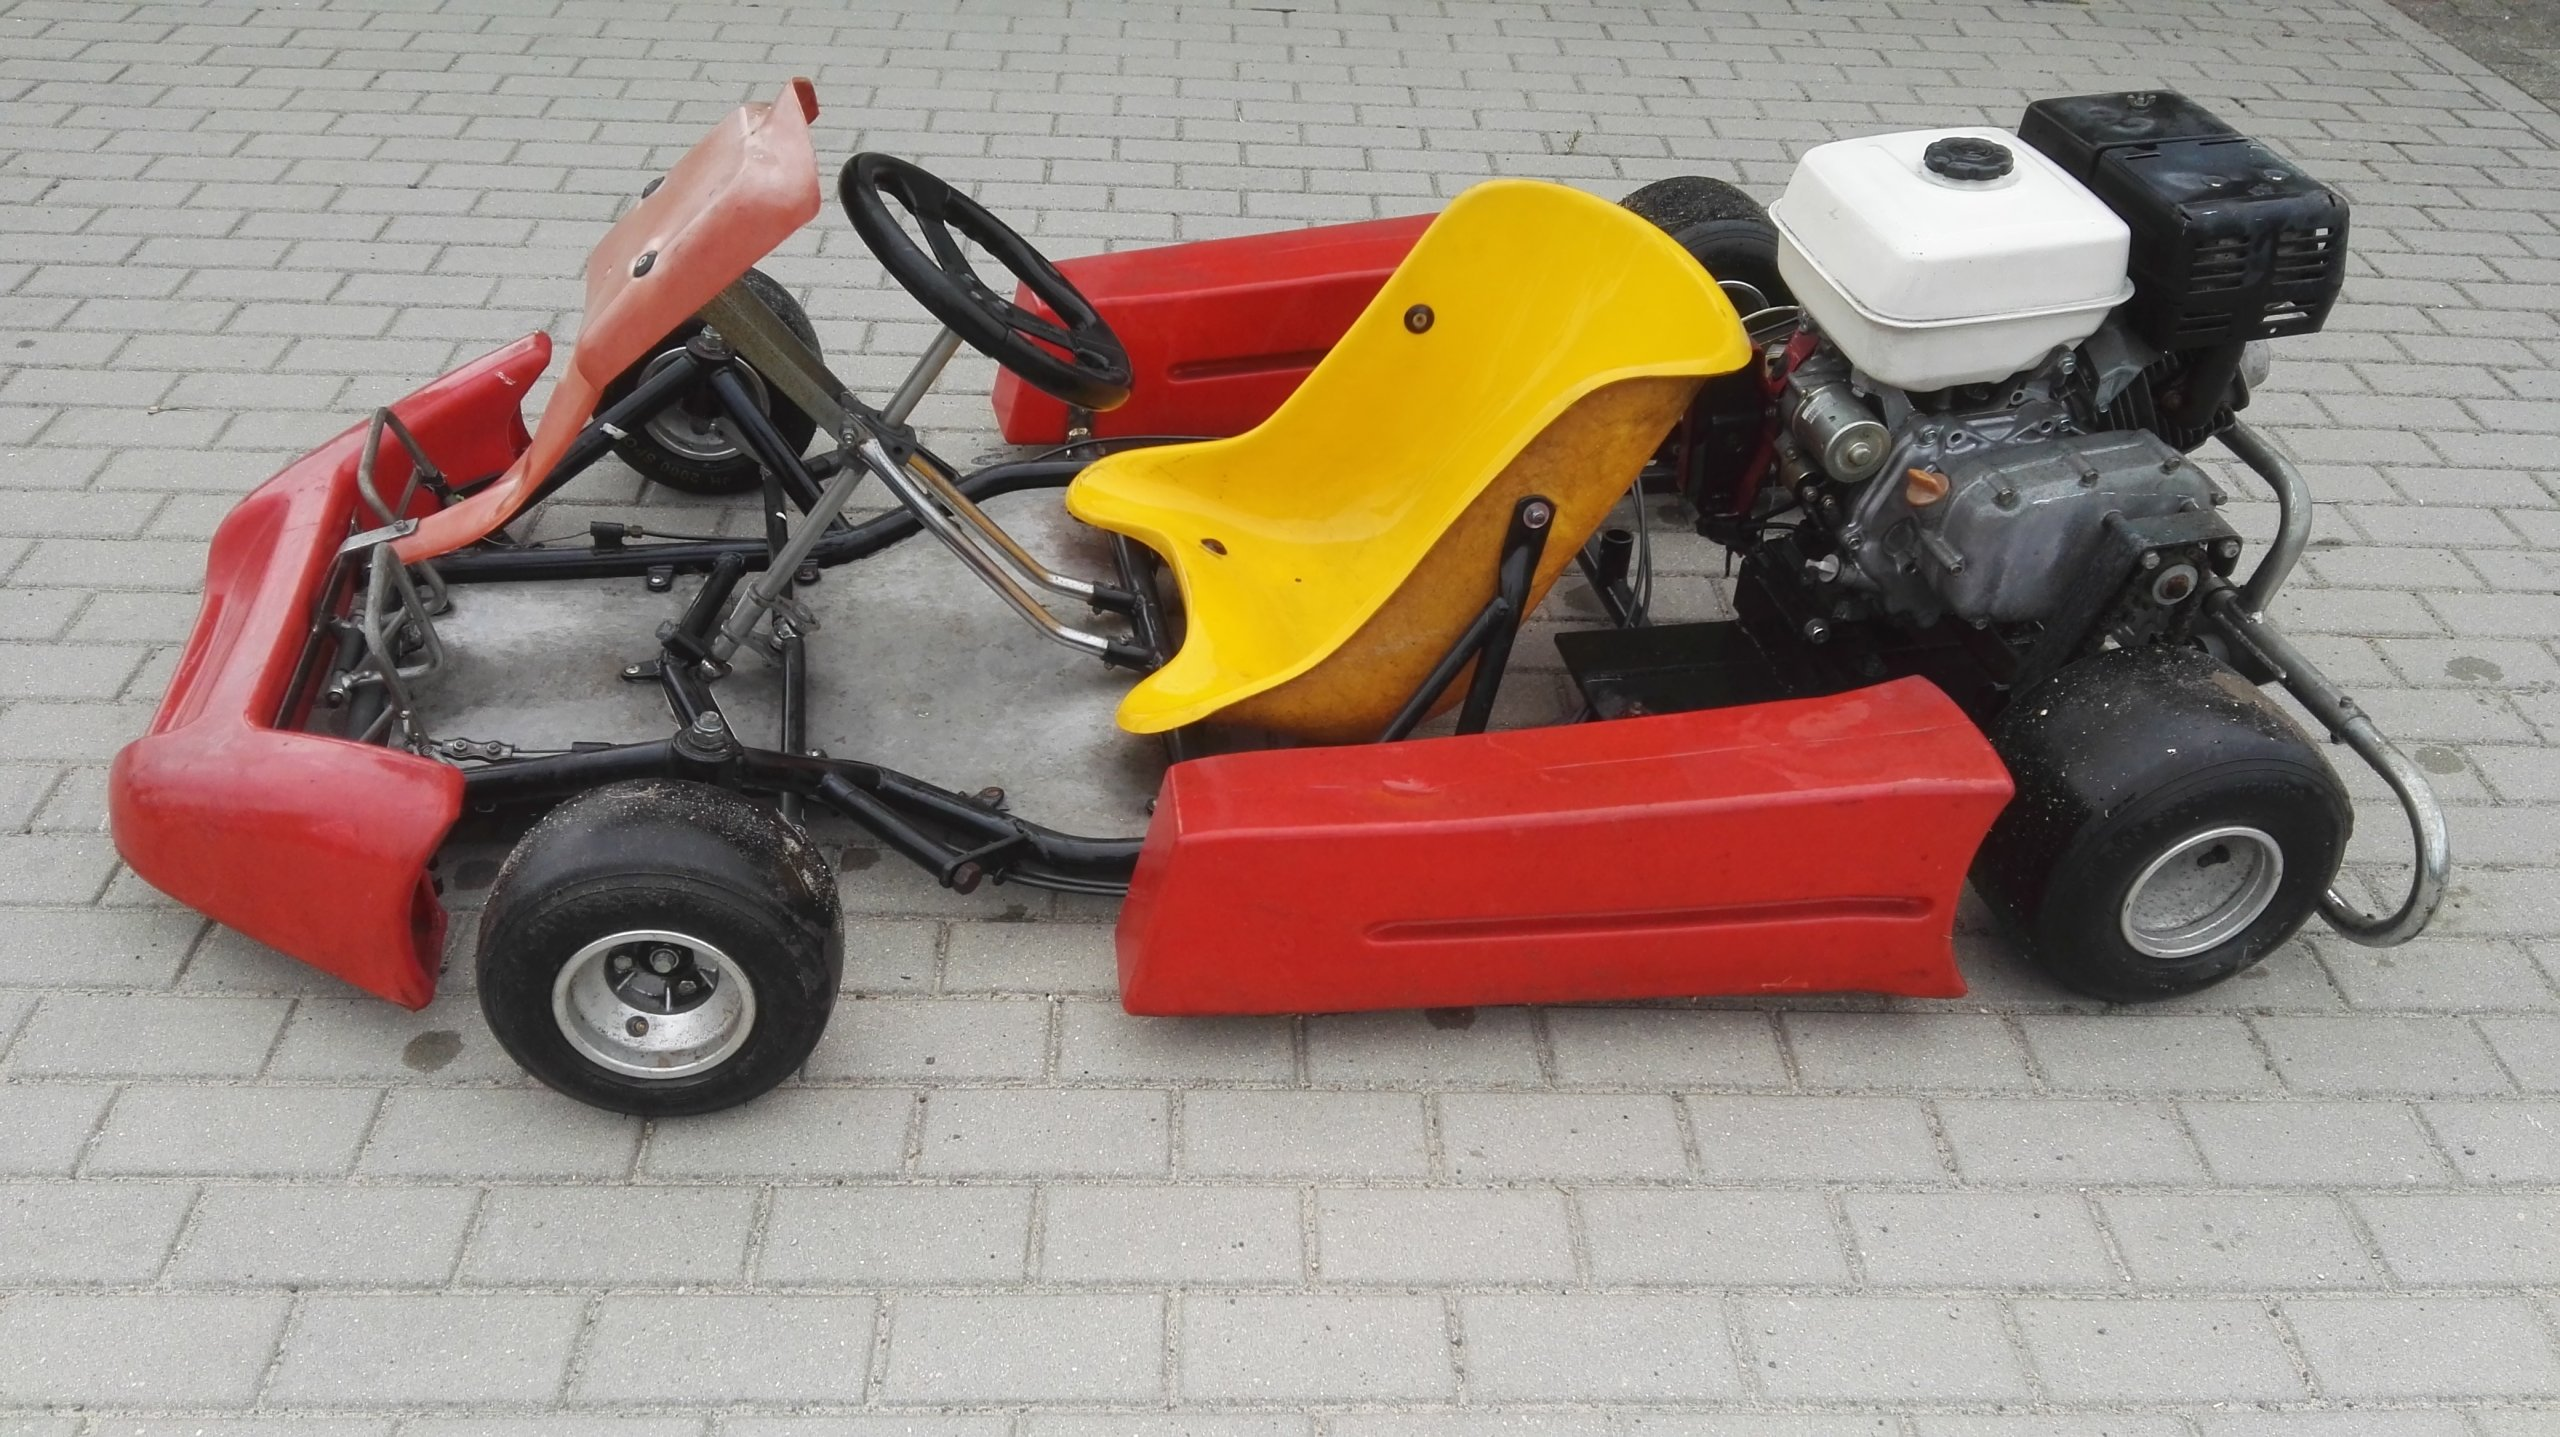 Orginalny gokart HONDA GX270 - 7101248189 - oficjalne